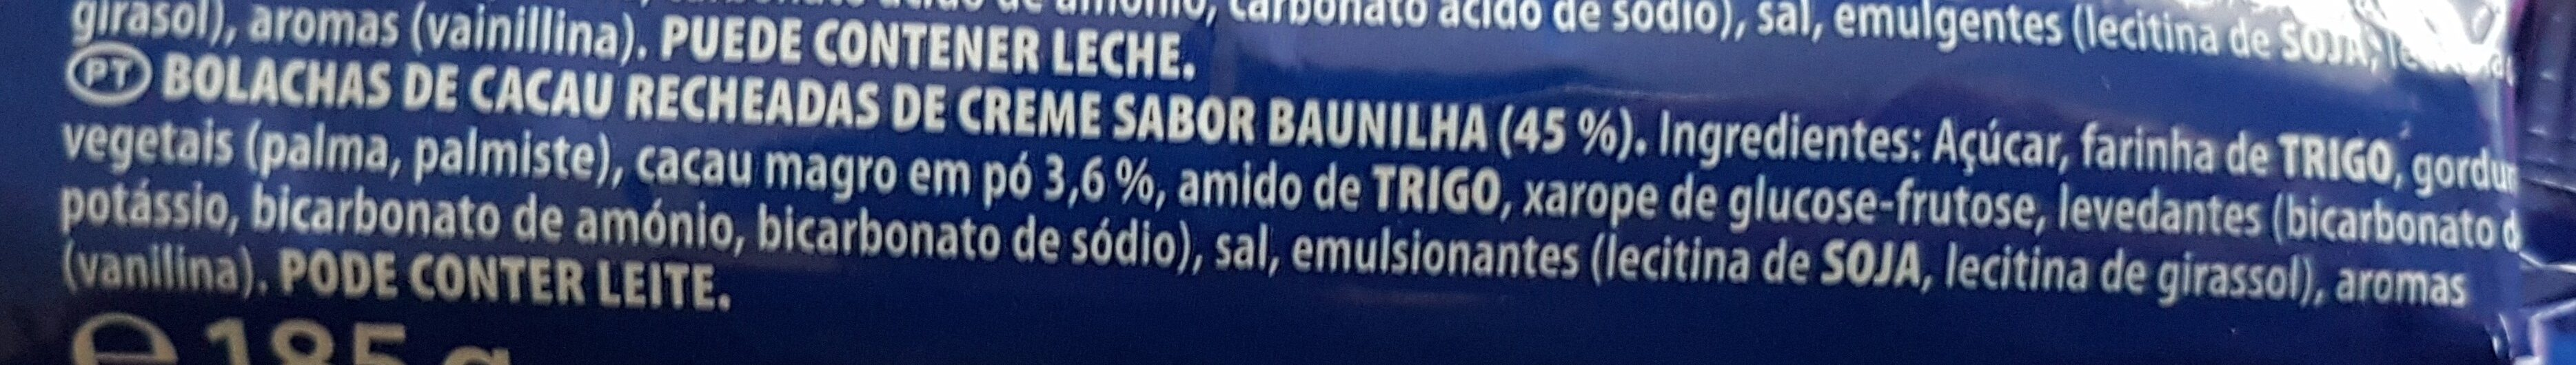 Galetes Oreo Doble Crema - Ingredients